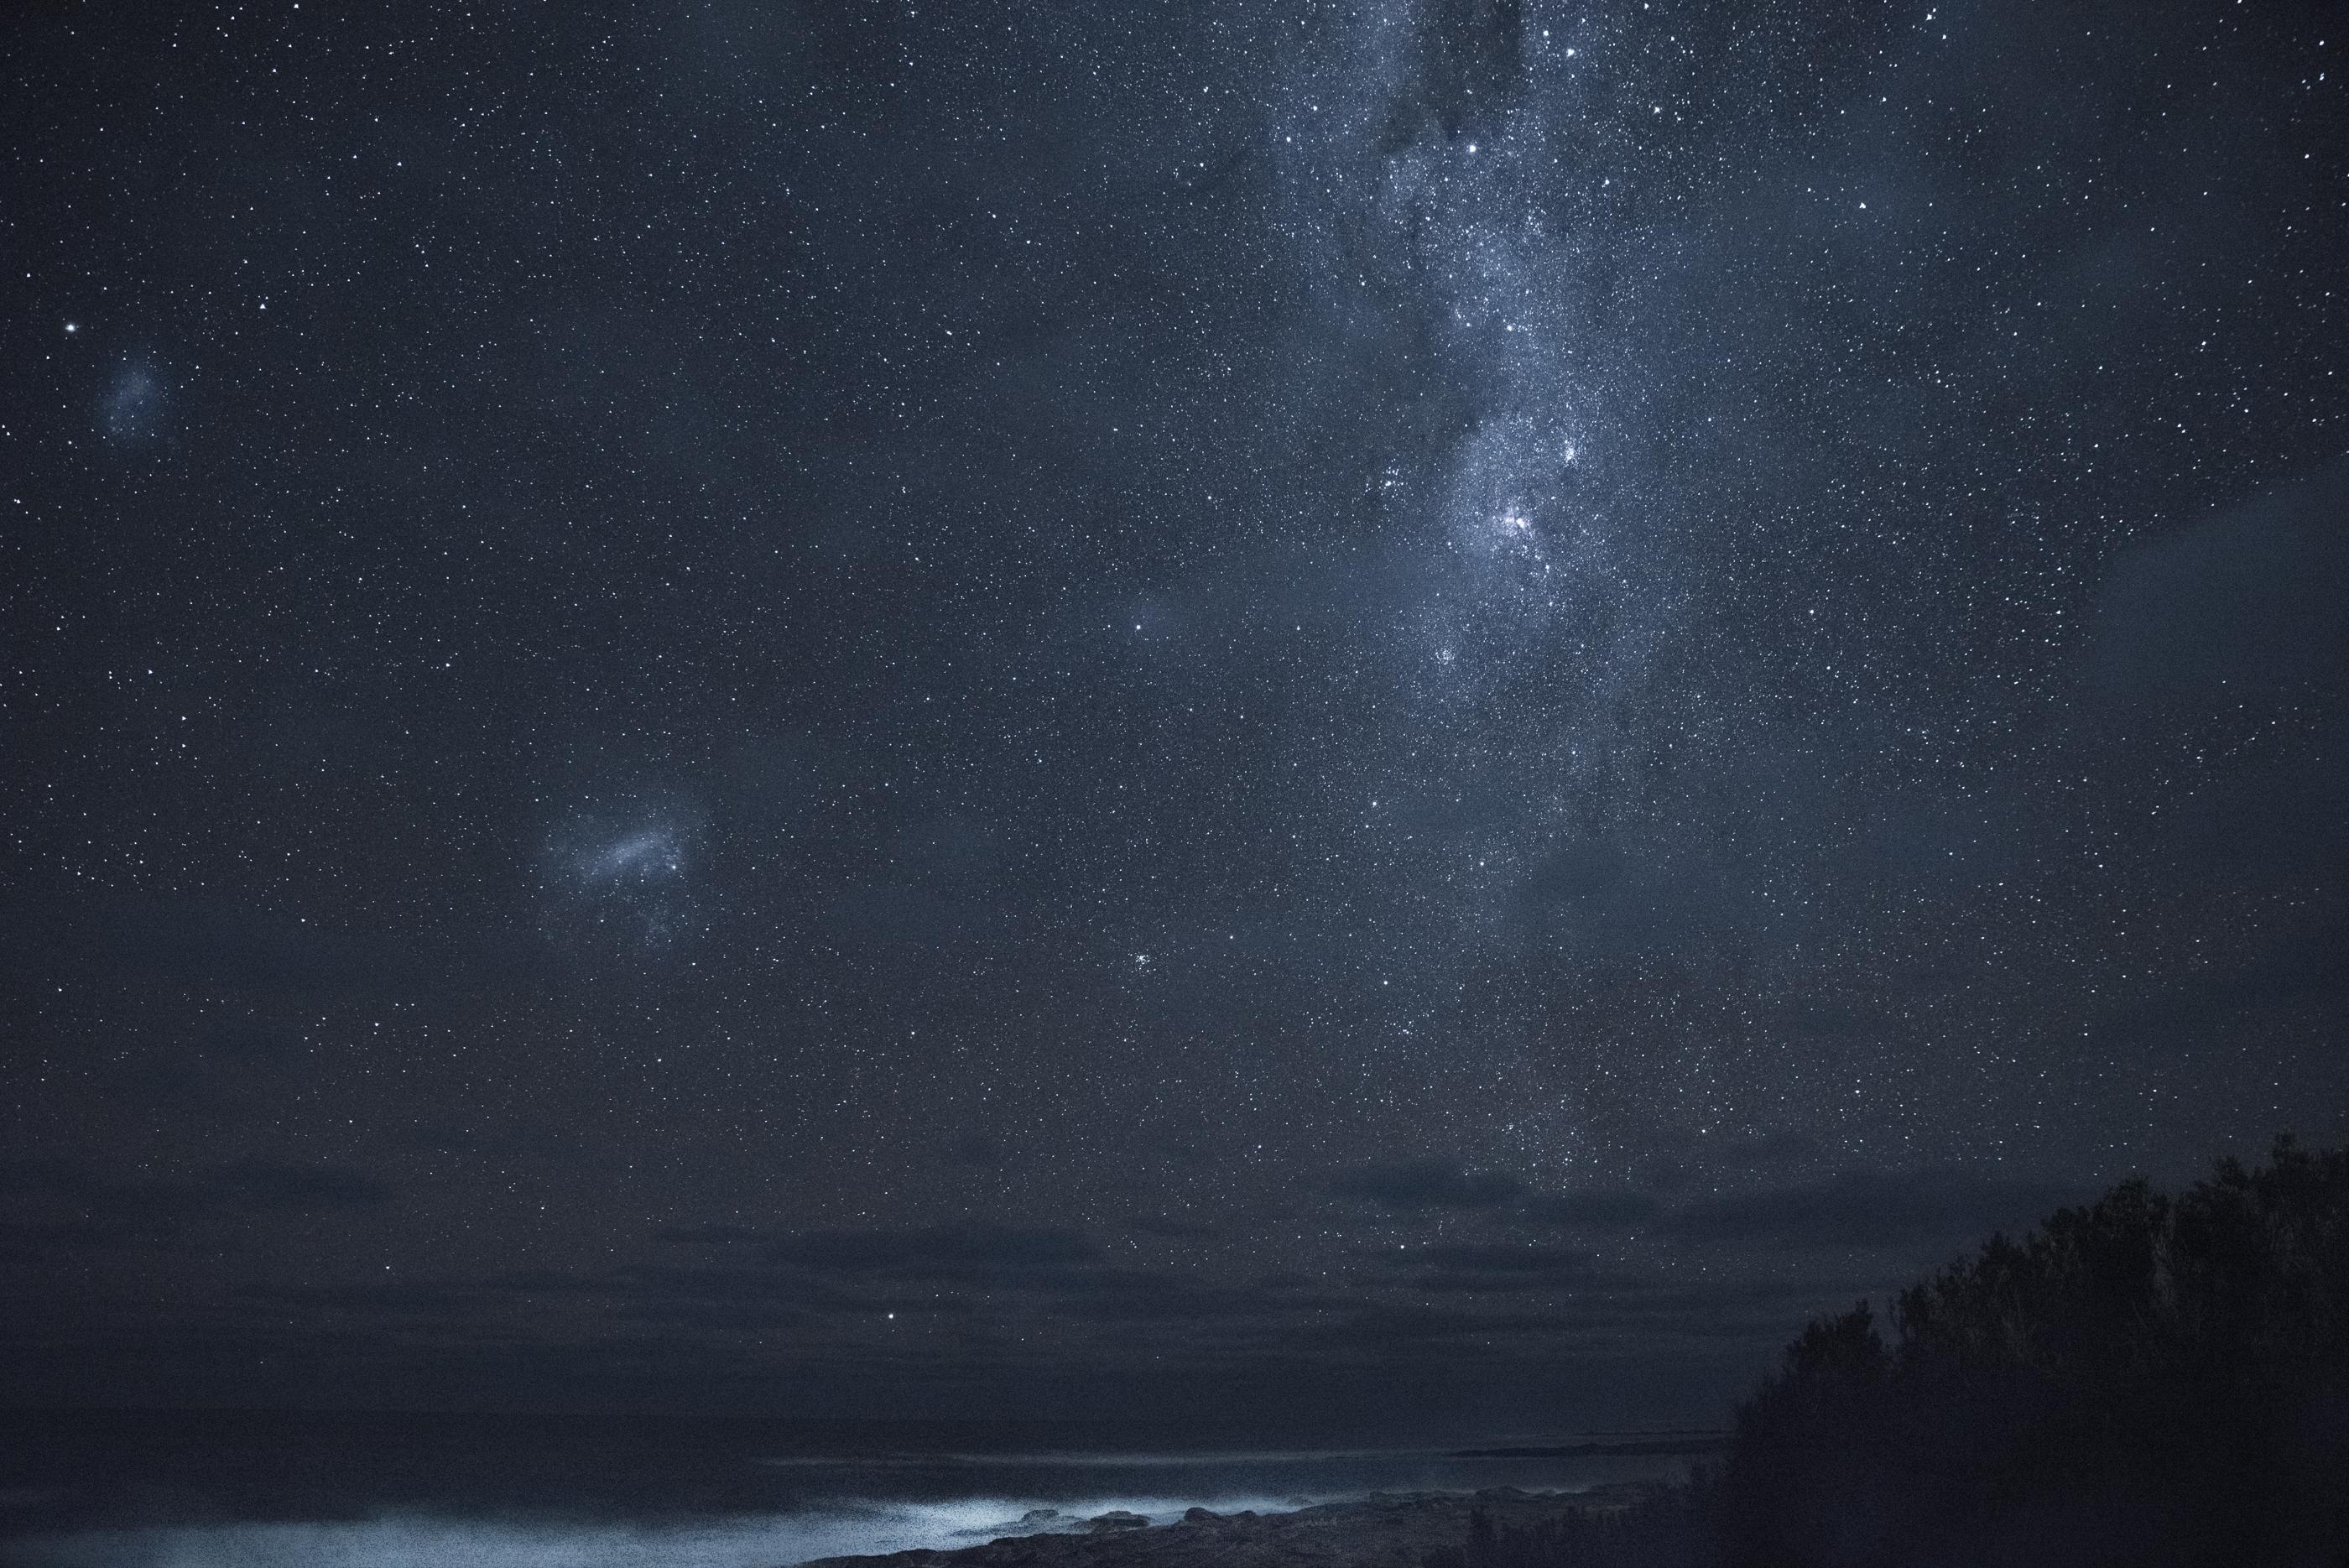 John Langmead_Milky Way June 2018_5314_20180619_Online